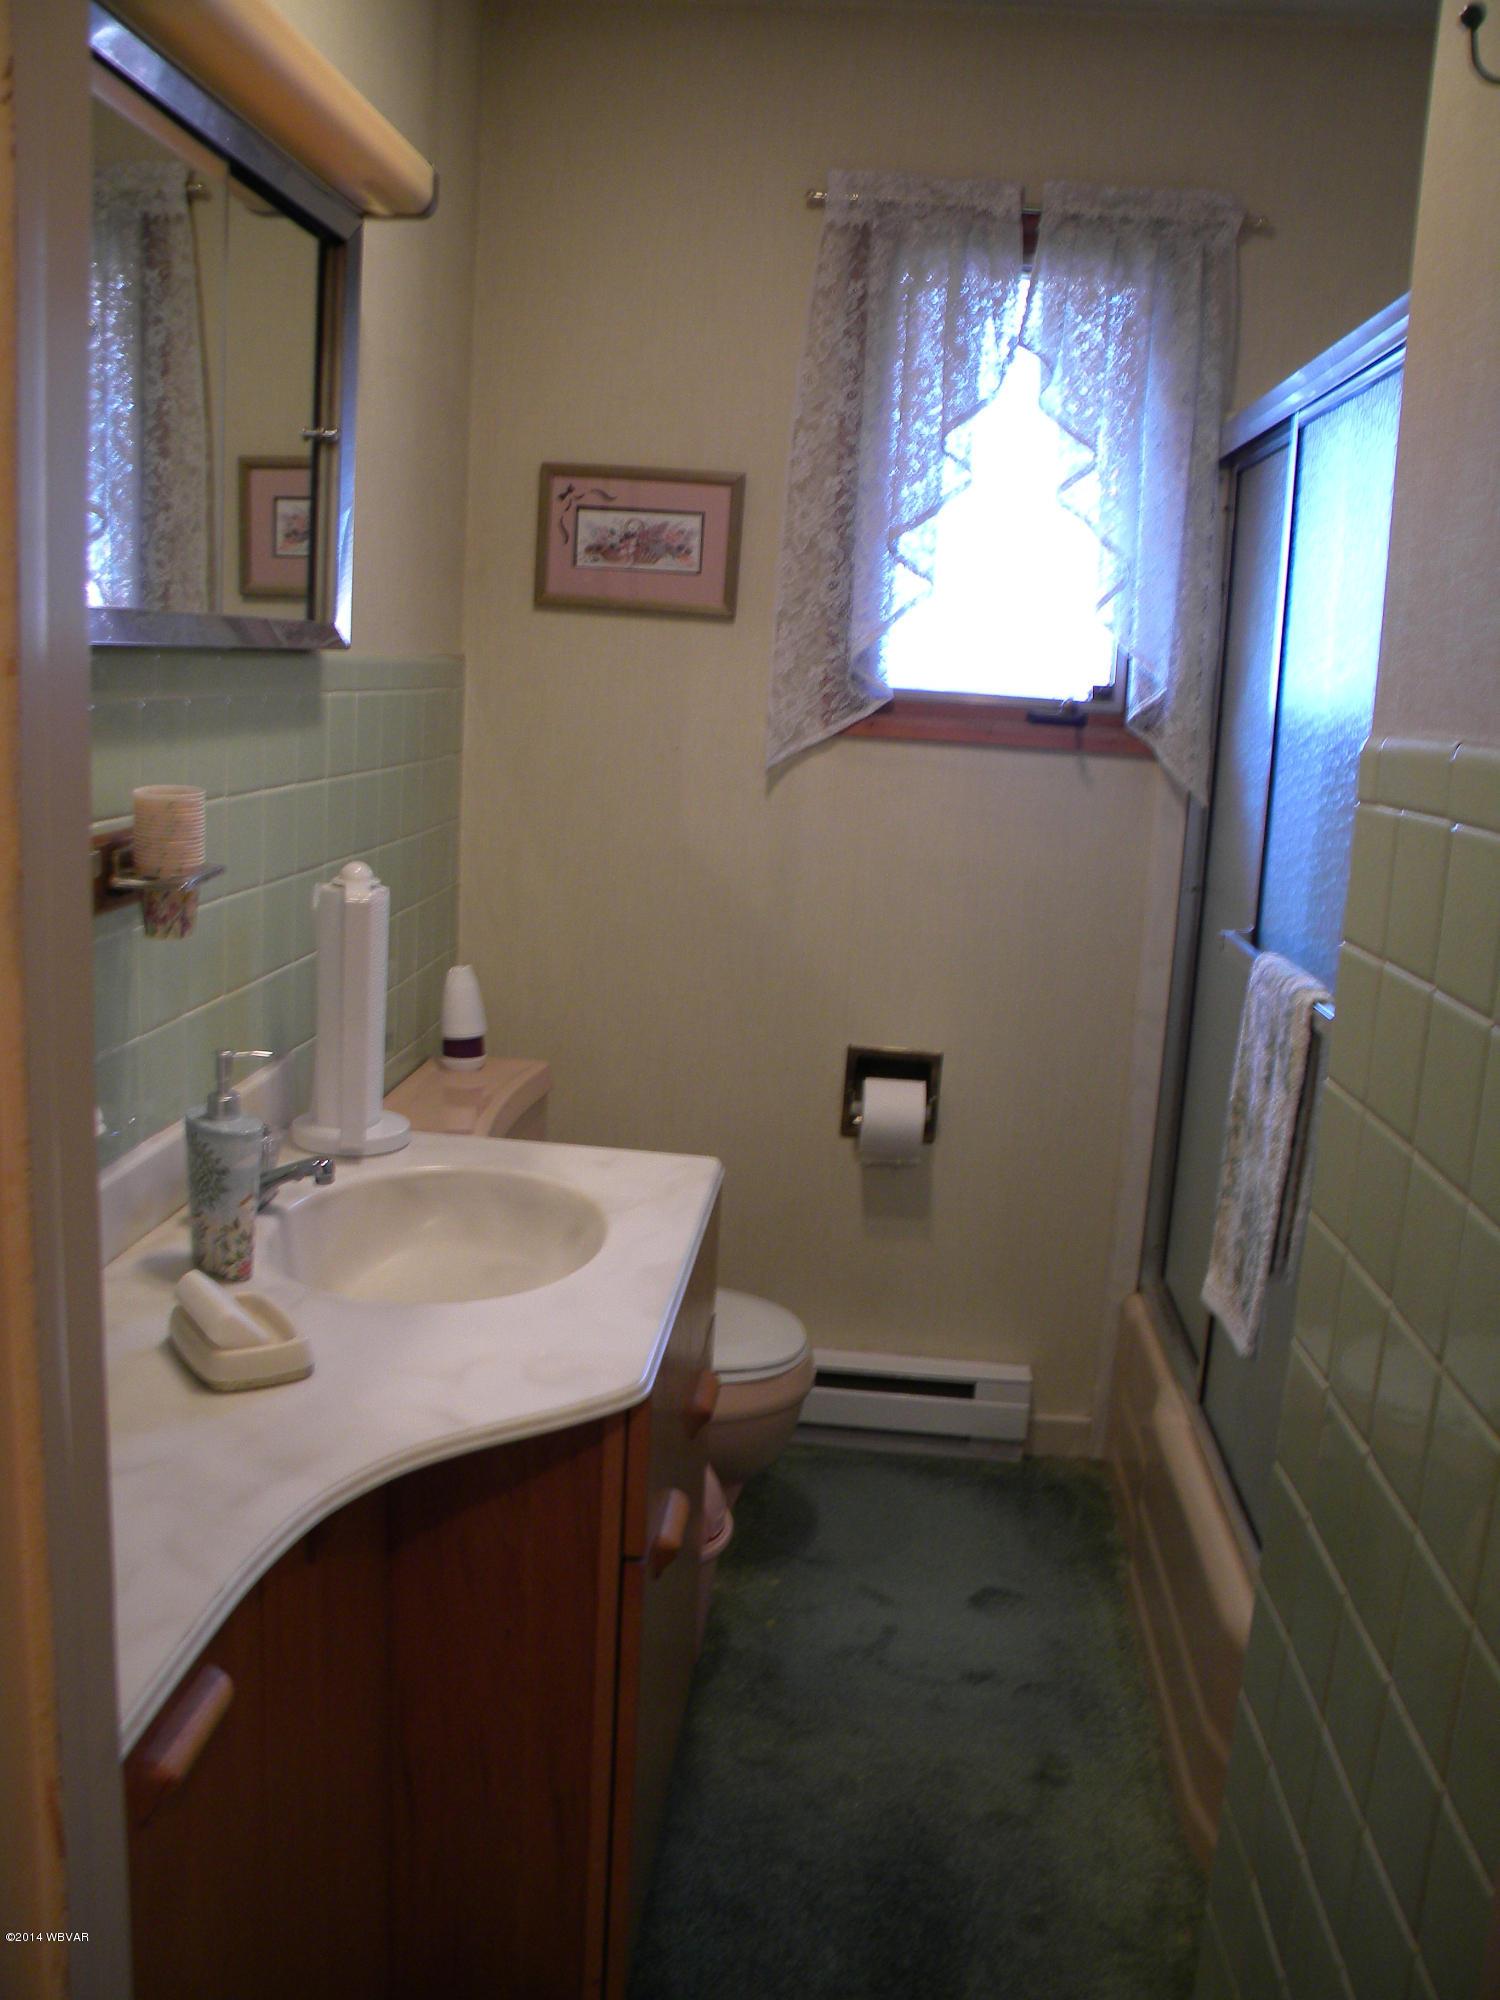 280 WOODLAND AVENUE,Williamsport,PA 17701,3 Bedrooms Bedrooms,2 BathroomsBathrooms,Residential,WOODLAND,WB-88523